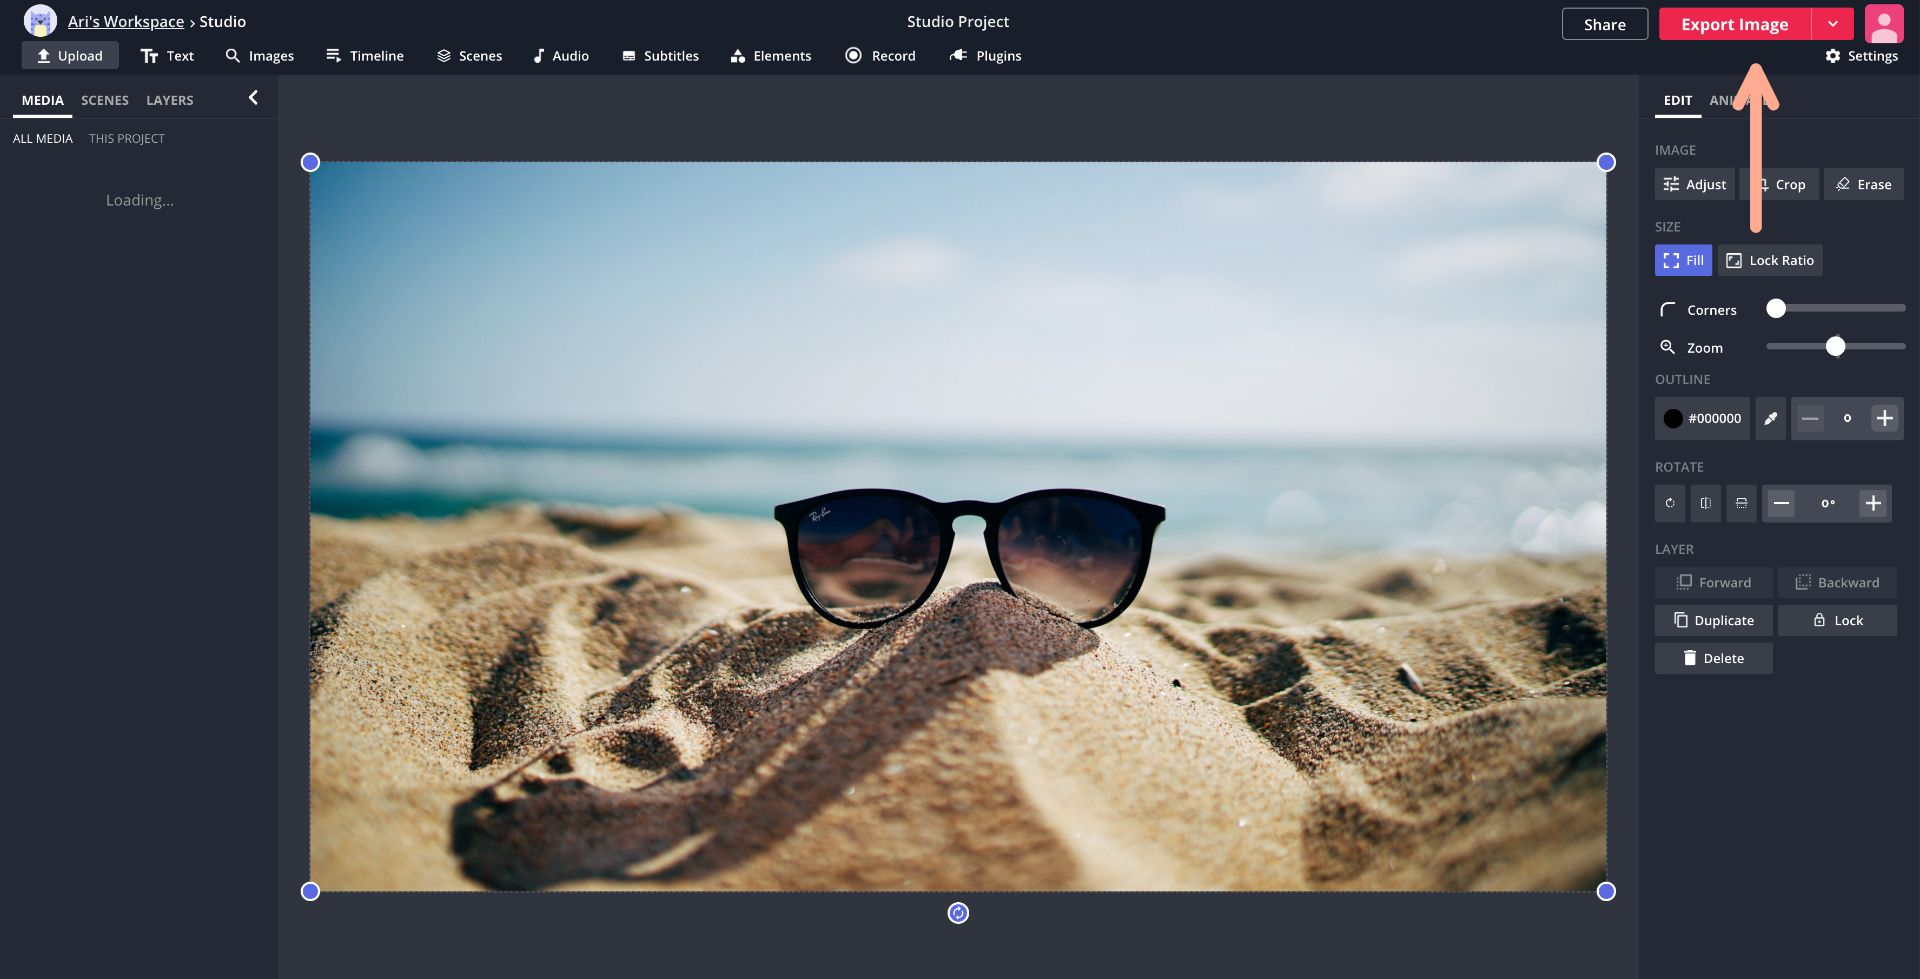 screenshot showing how to export an image in Kapwing Studio